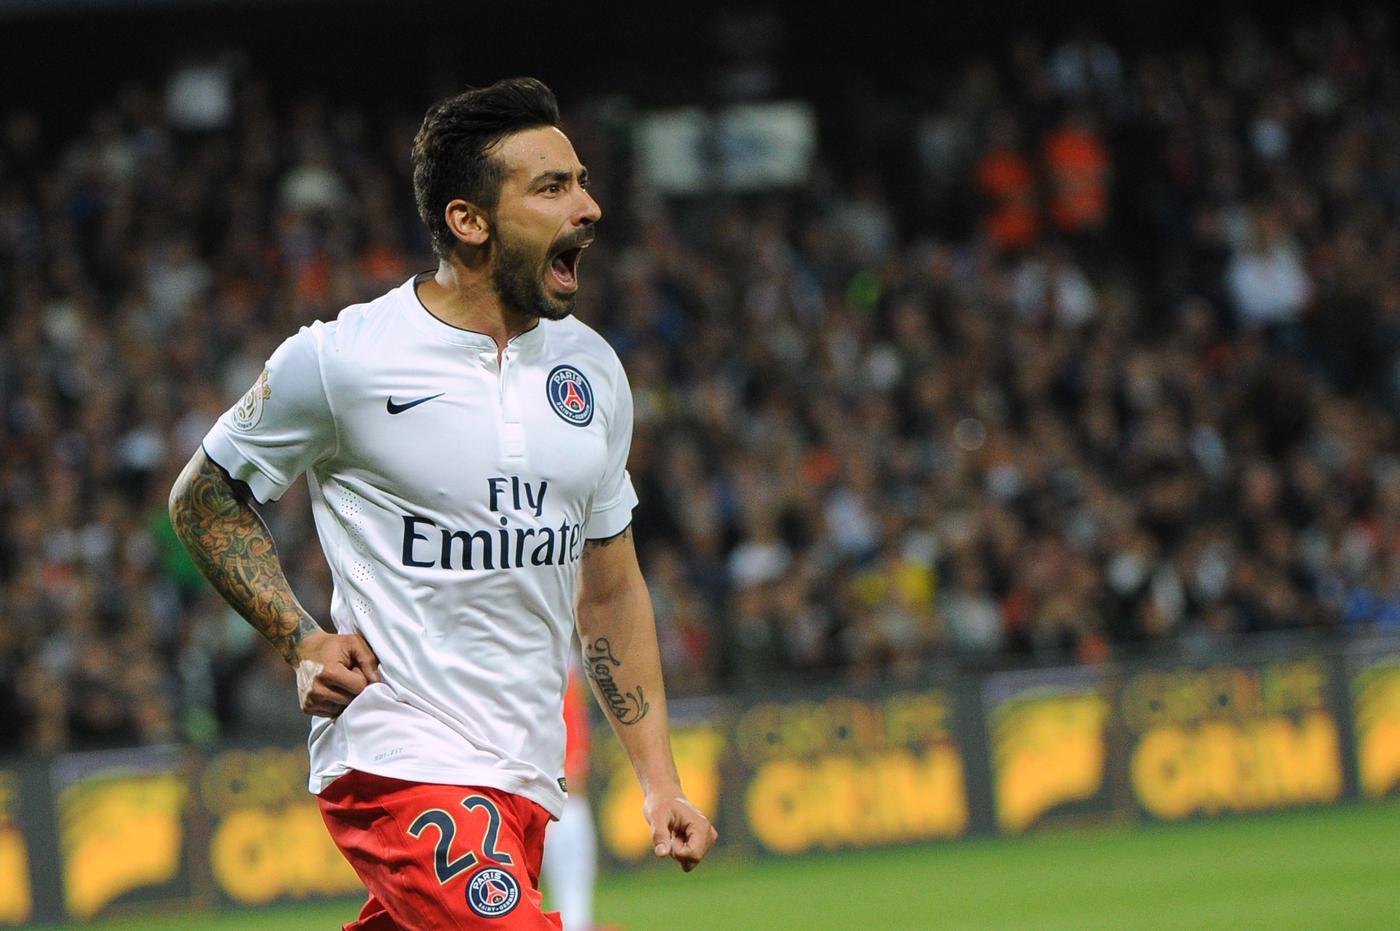 Manchester United 'make transfer offer to Paris St Germain forward Ezequiel Lavezzi'